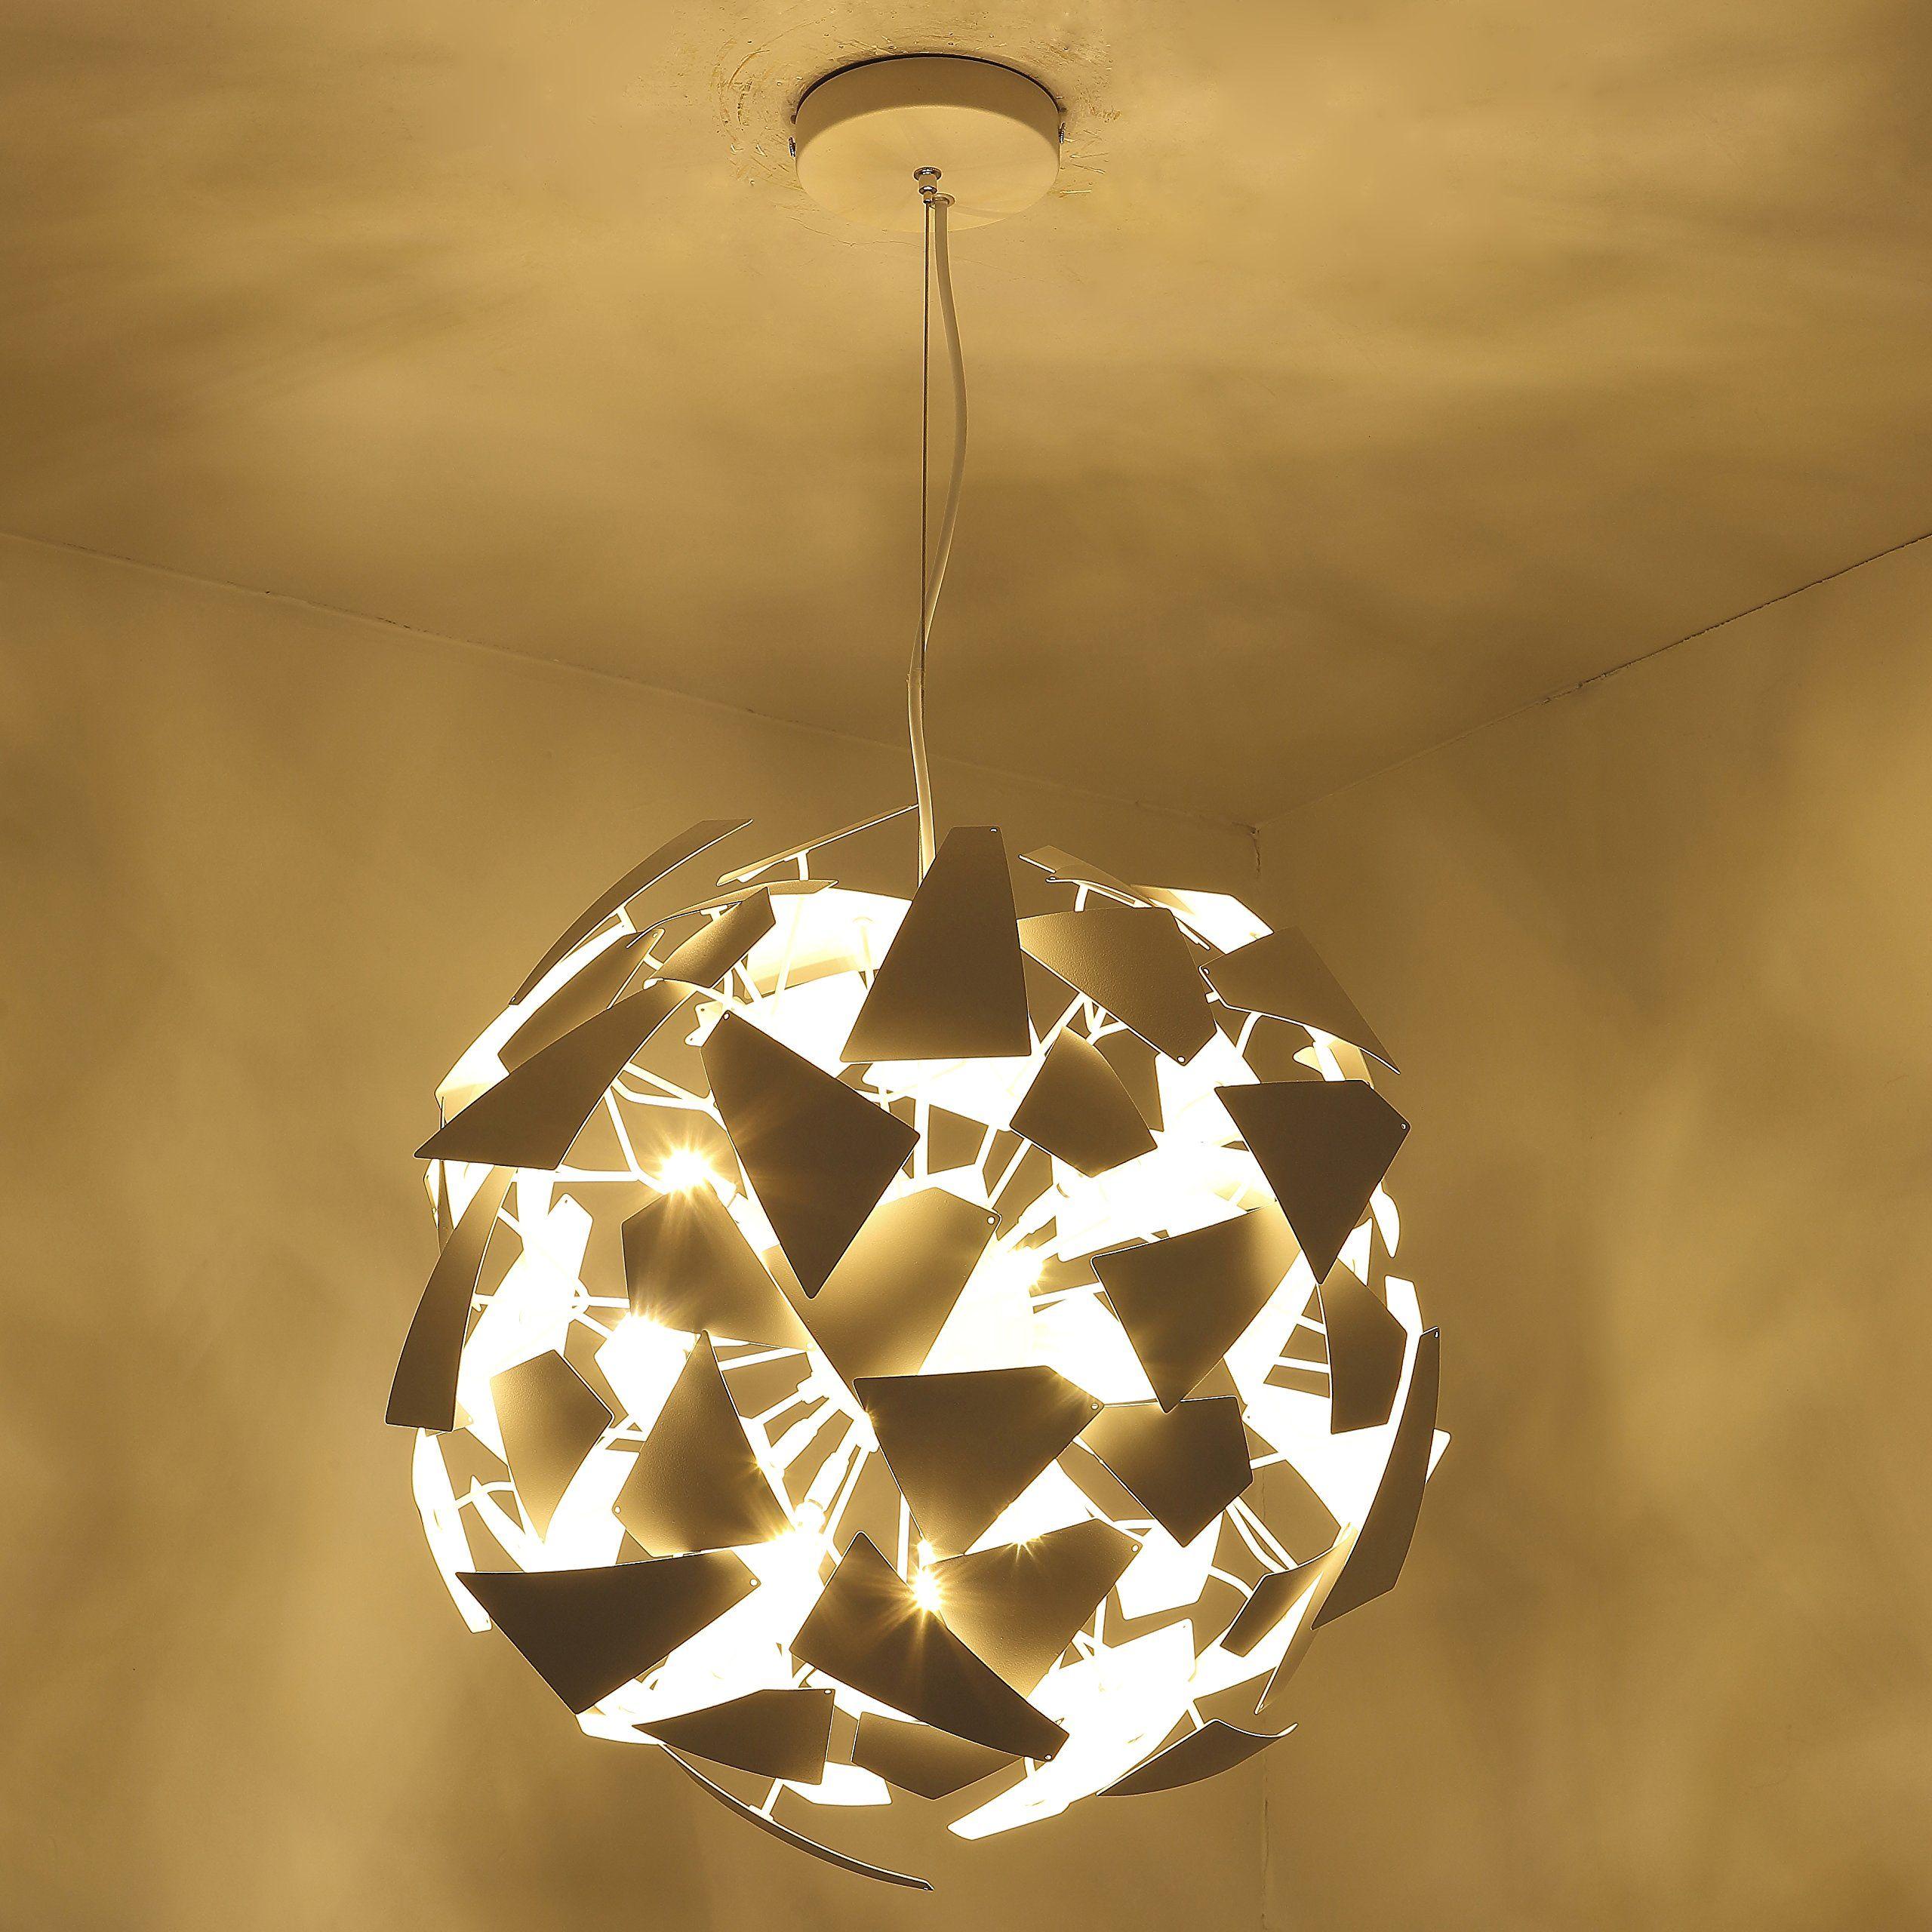 Seollight Modern Smartness Creative Diy Designer Pendant Light With 12